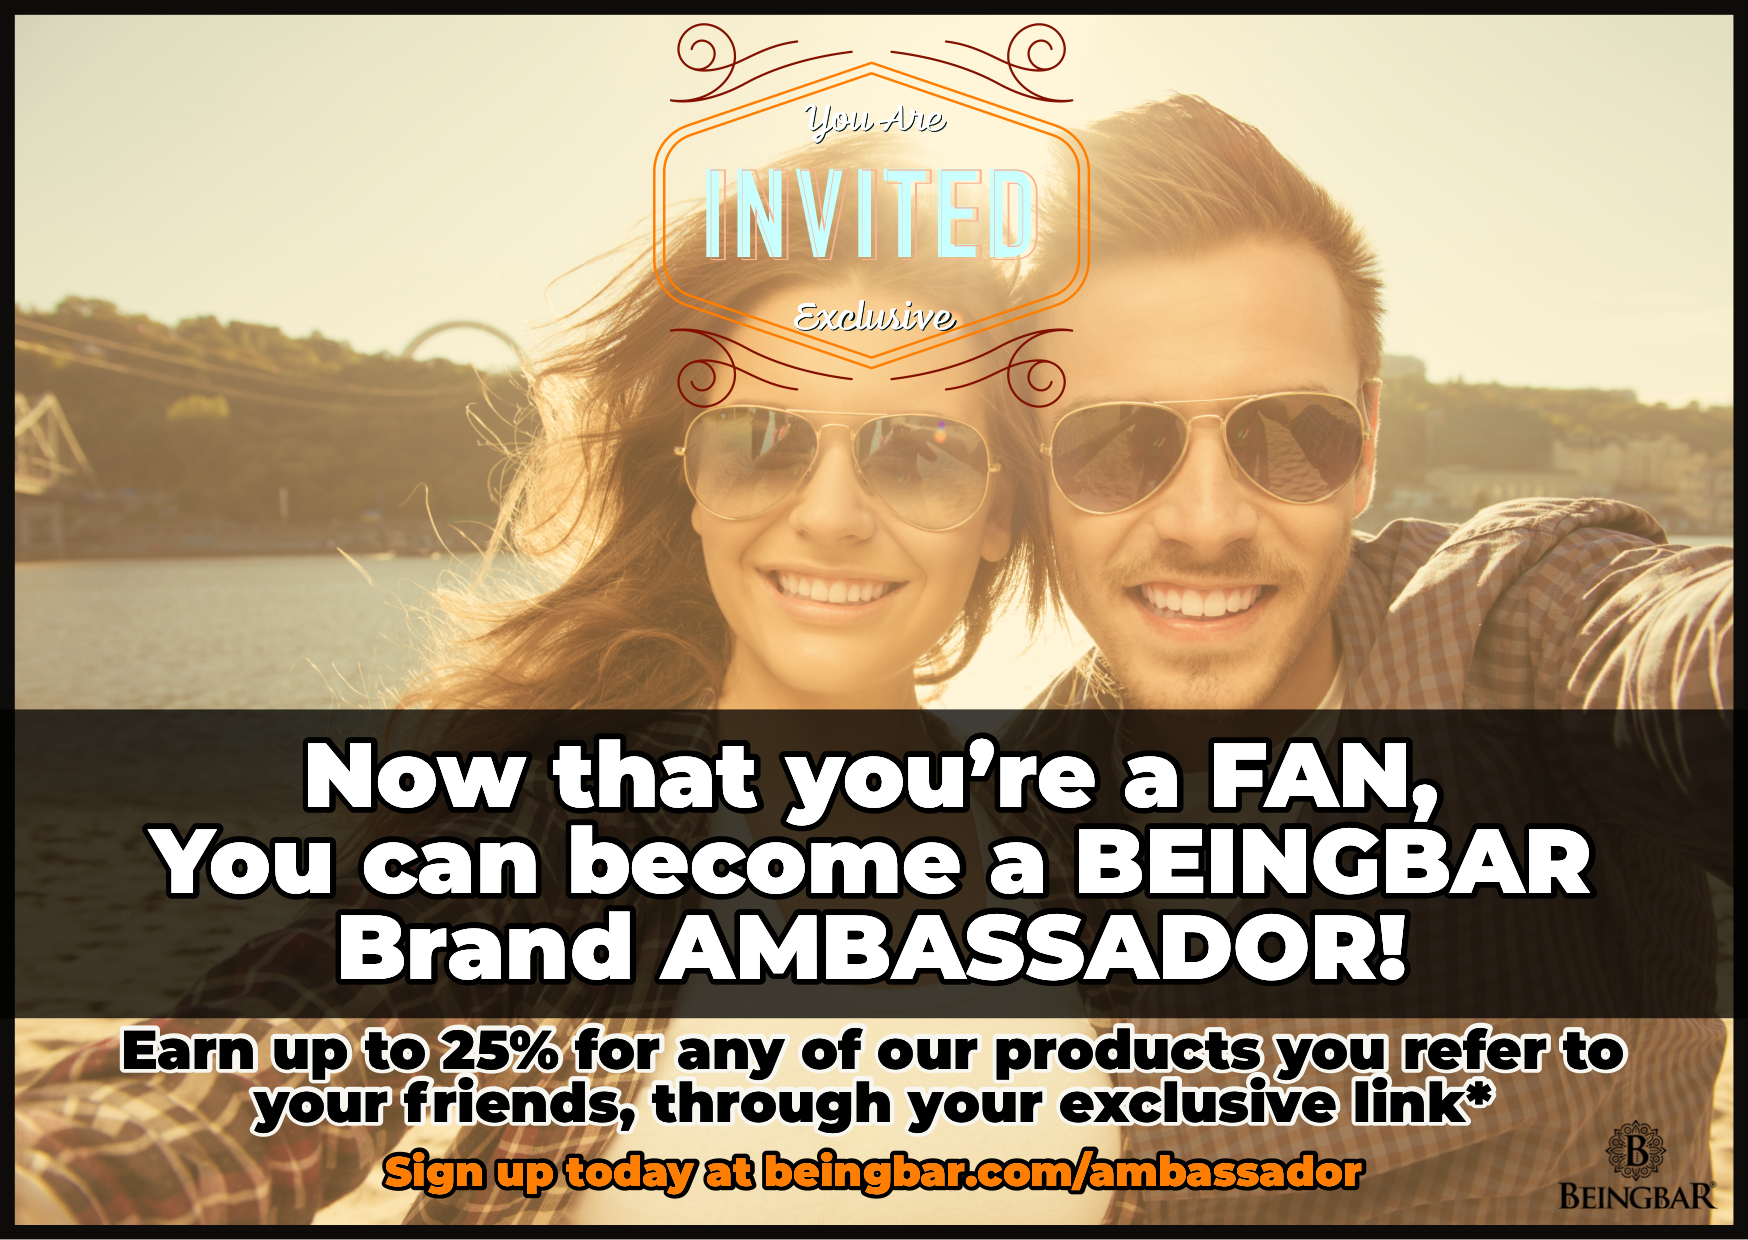 Become a BEINGBAR Ambassador - Join the Ambassador program